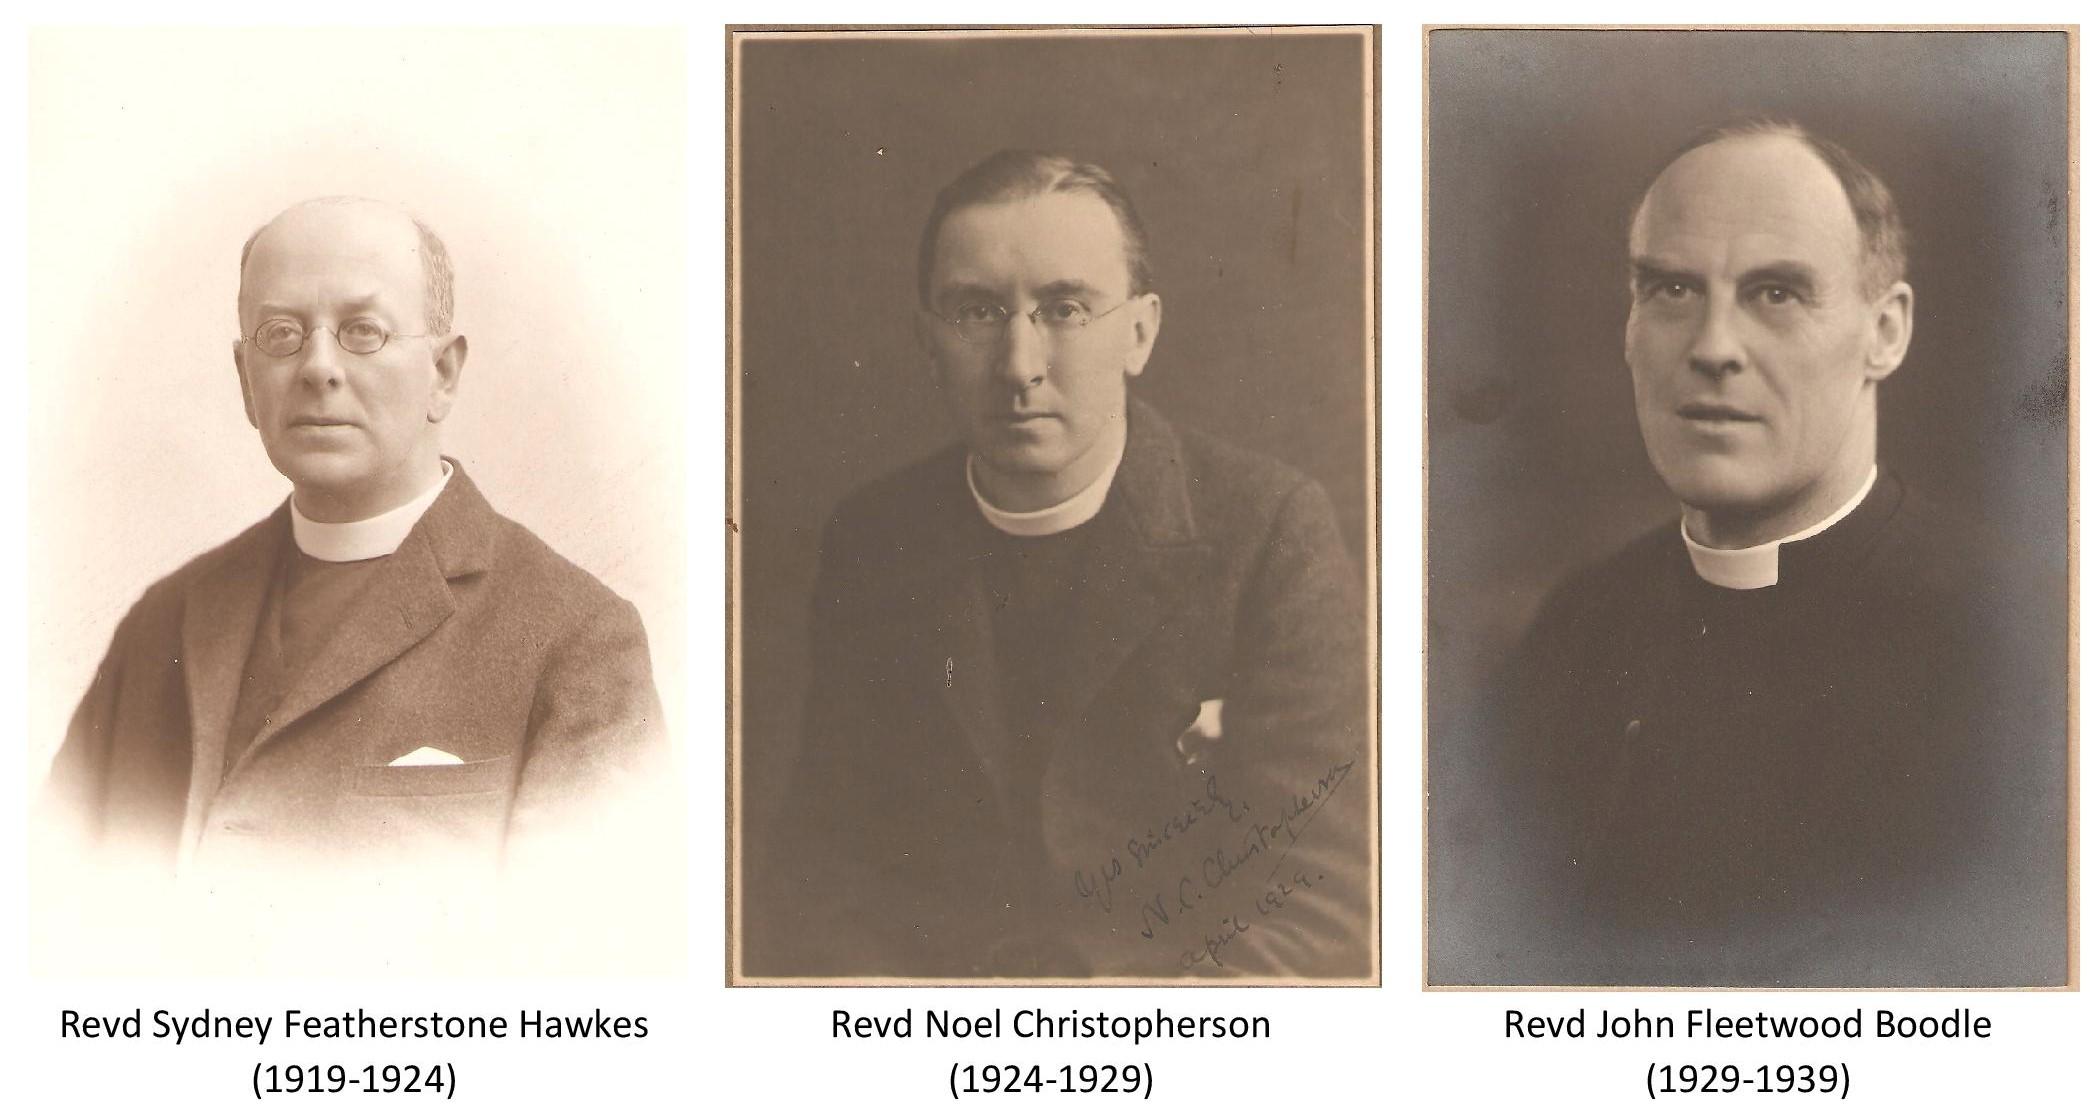 Revd Sydney Featherstone Hawkes, Revd Noel Christopherson and Revd John Fleetwood Boodle